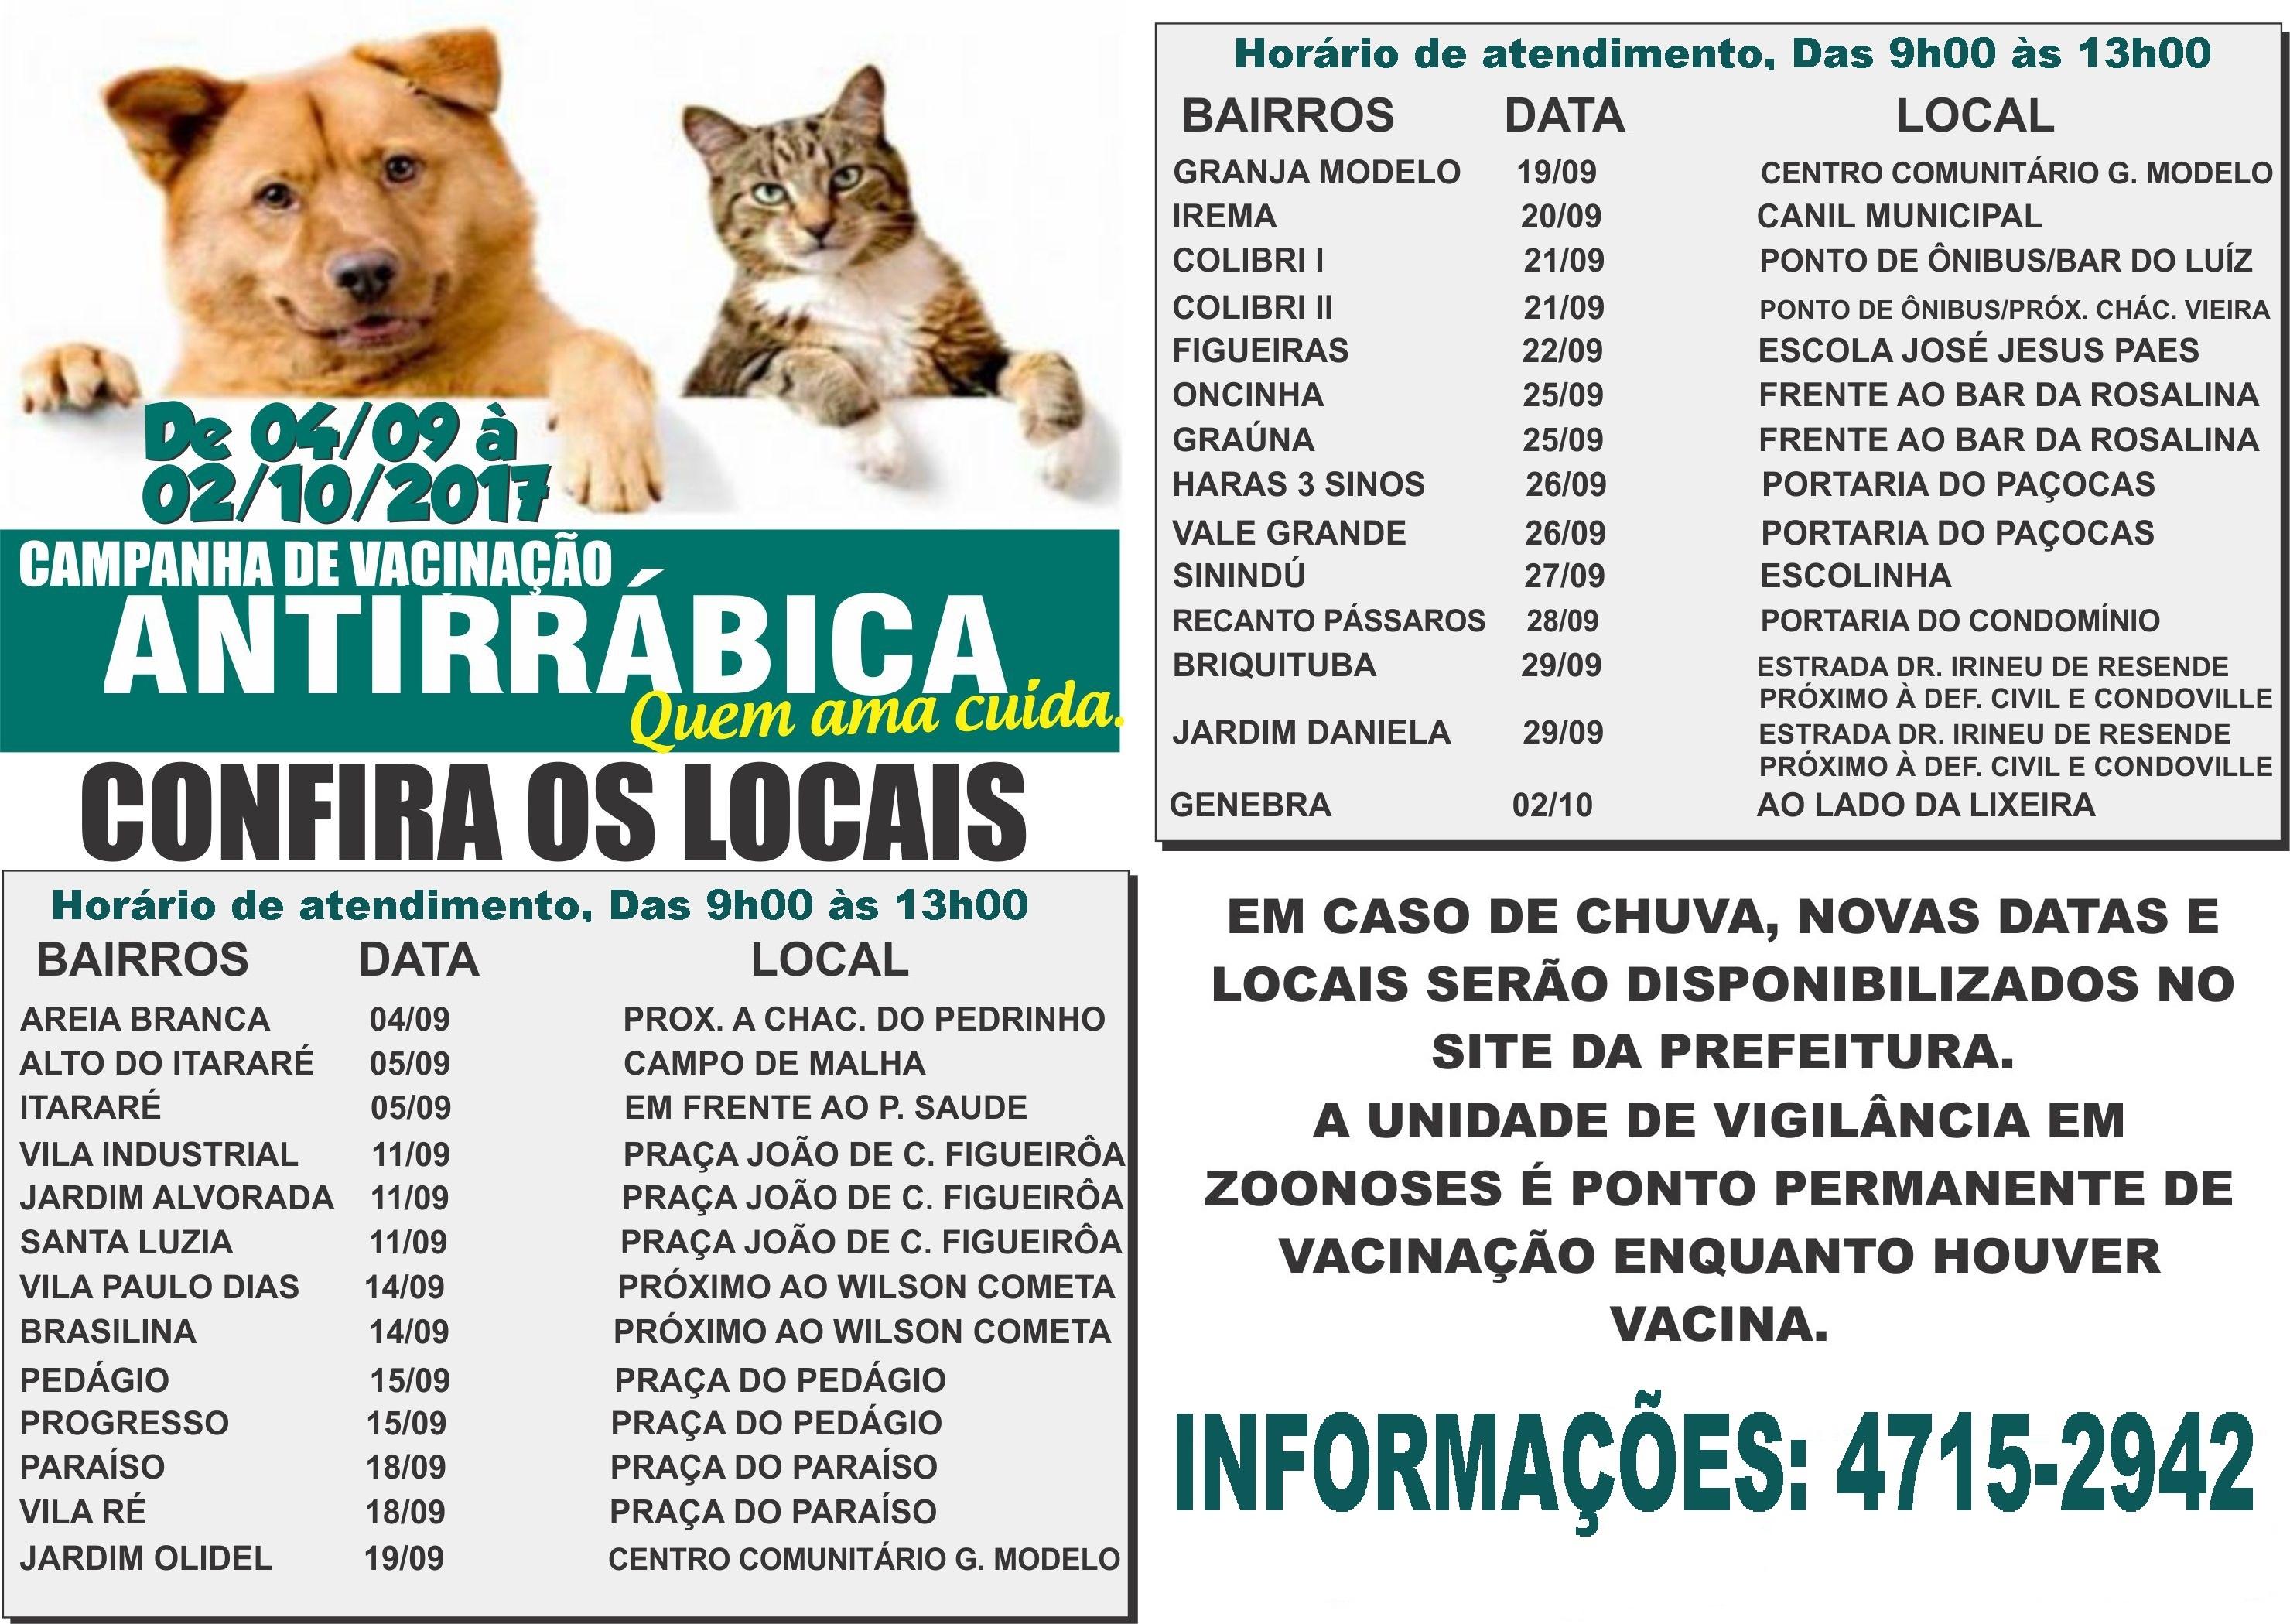 campanha-vacinaçao2-antirabica